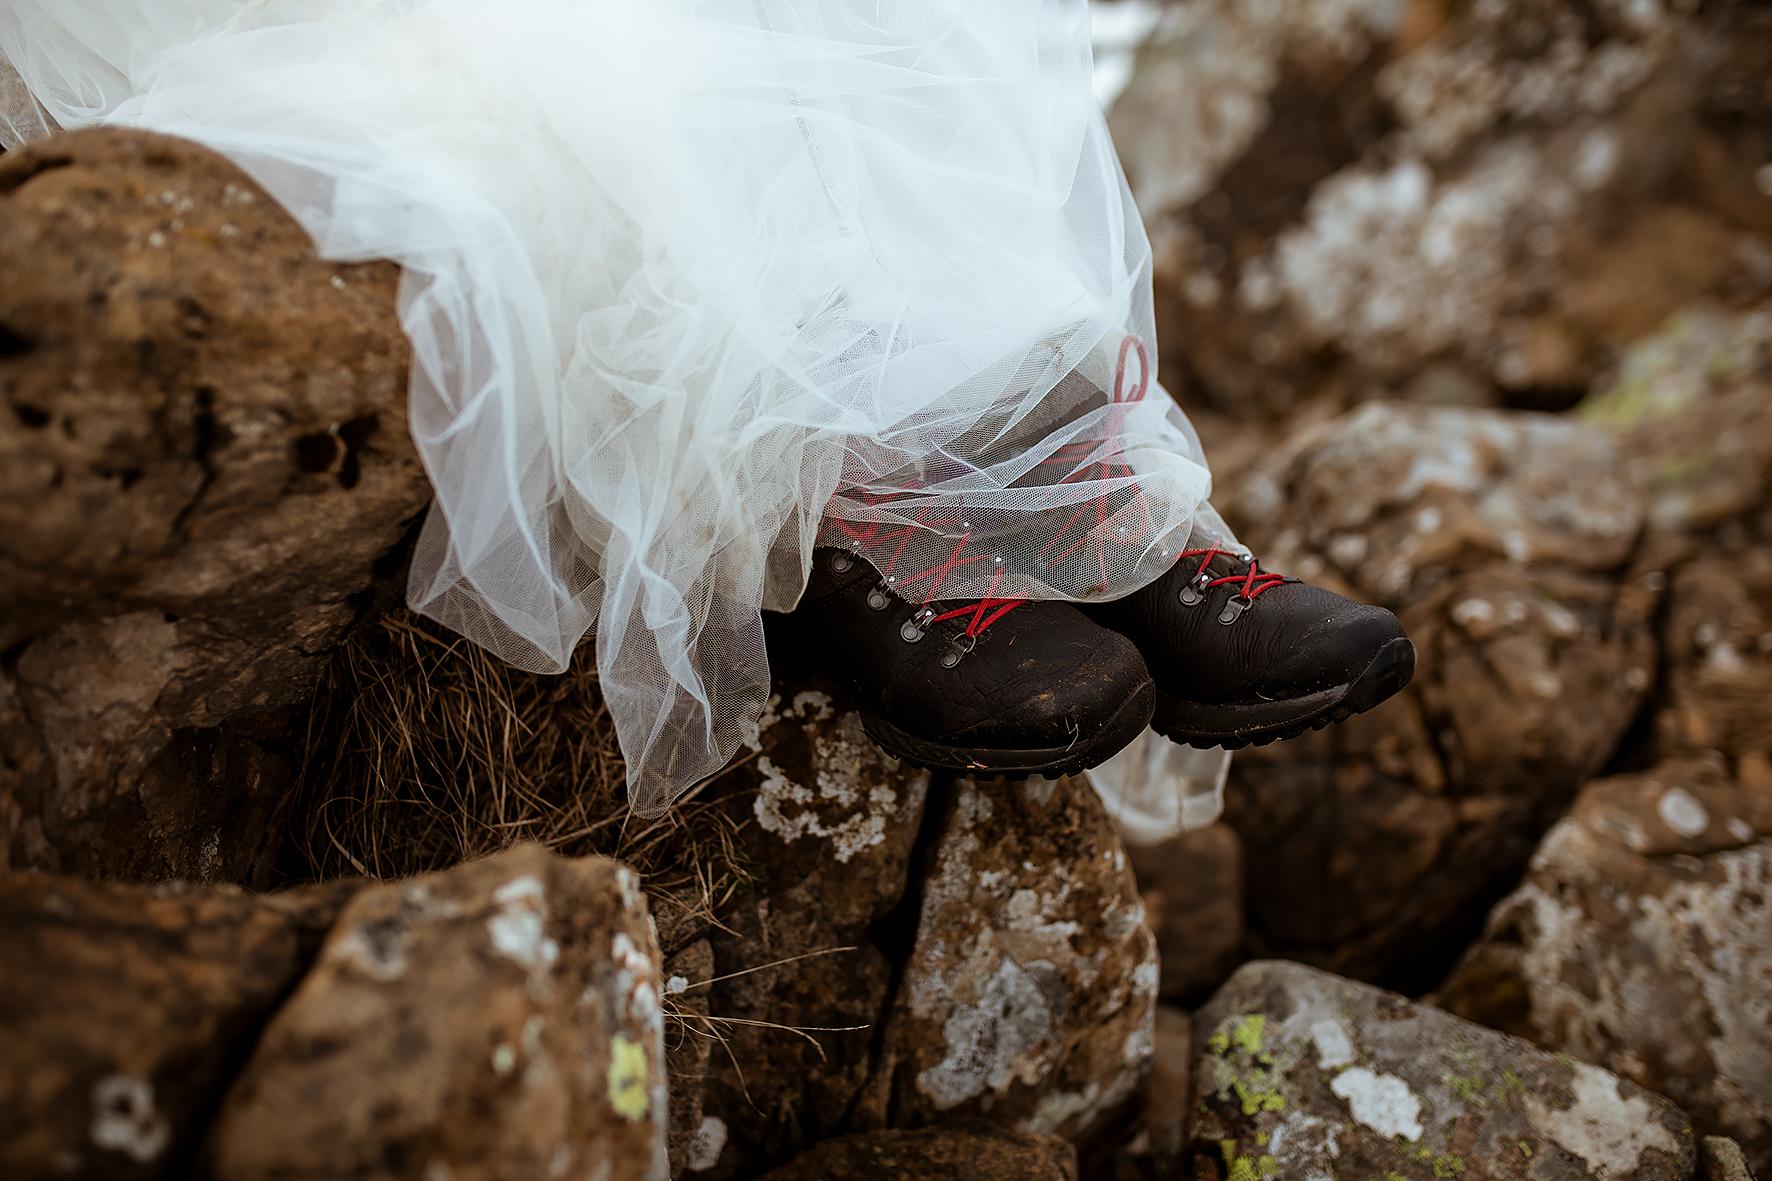 Hochzeitskleid_Wanderschuhe_Felsen_38